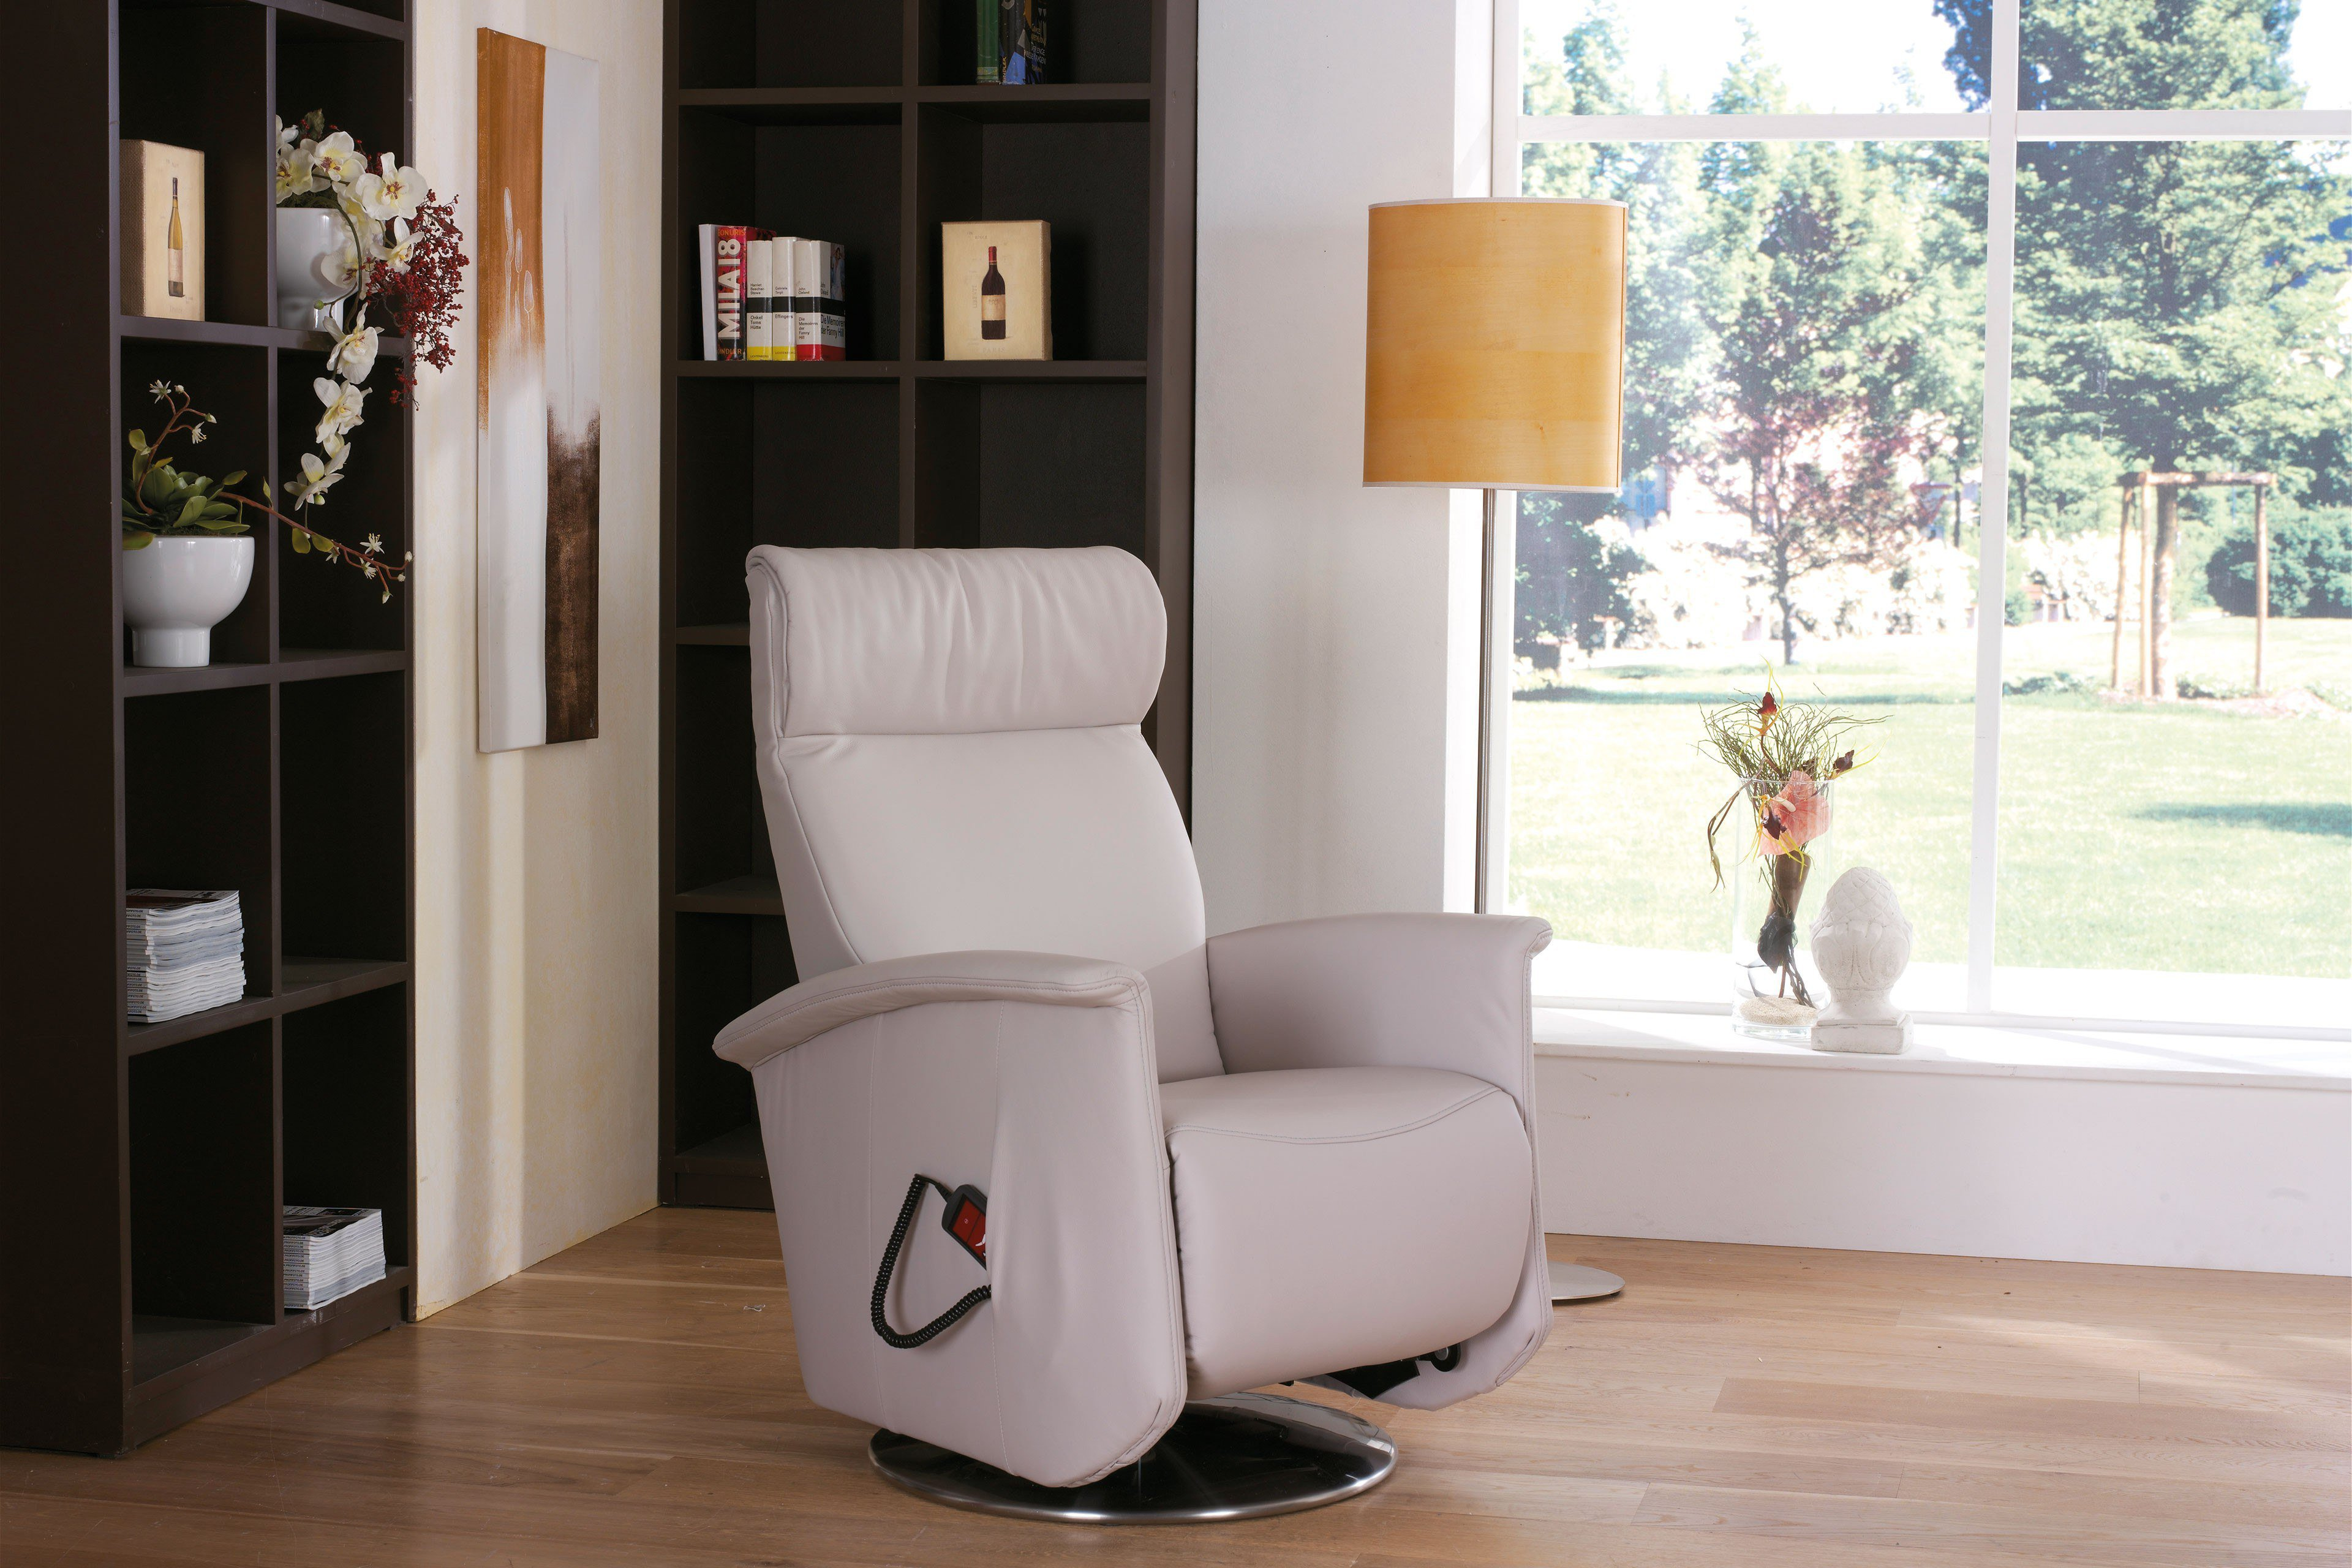 himolla 7238 relaxsessel wei m bel letz ihr online shop. Black Bedroom Furniture Sets. Home Design Ideas